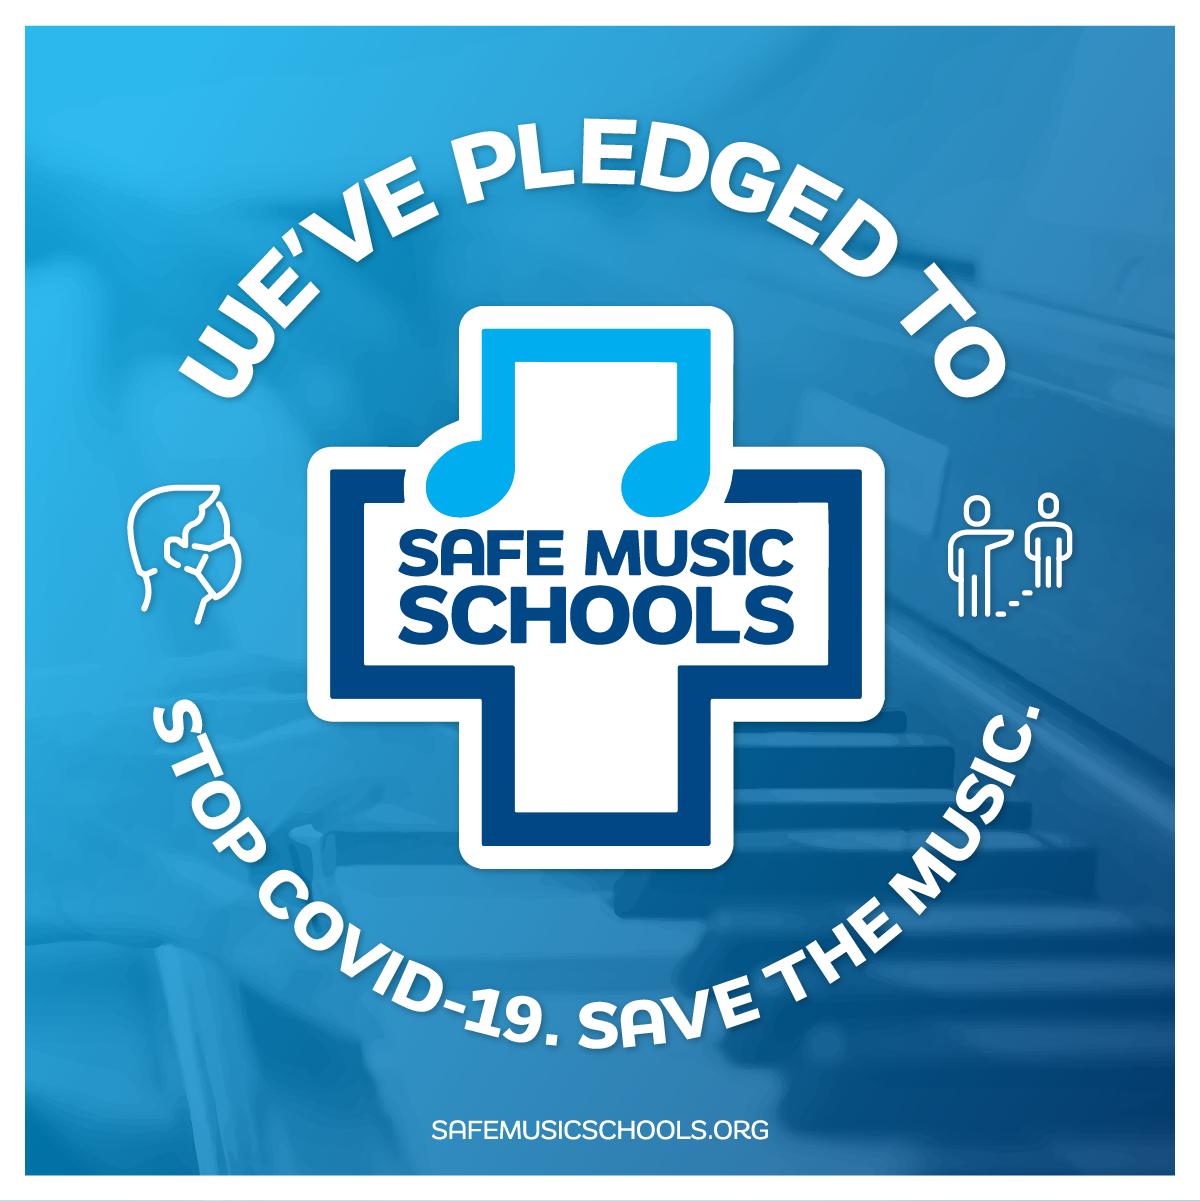 Safe Music Schools Pledge